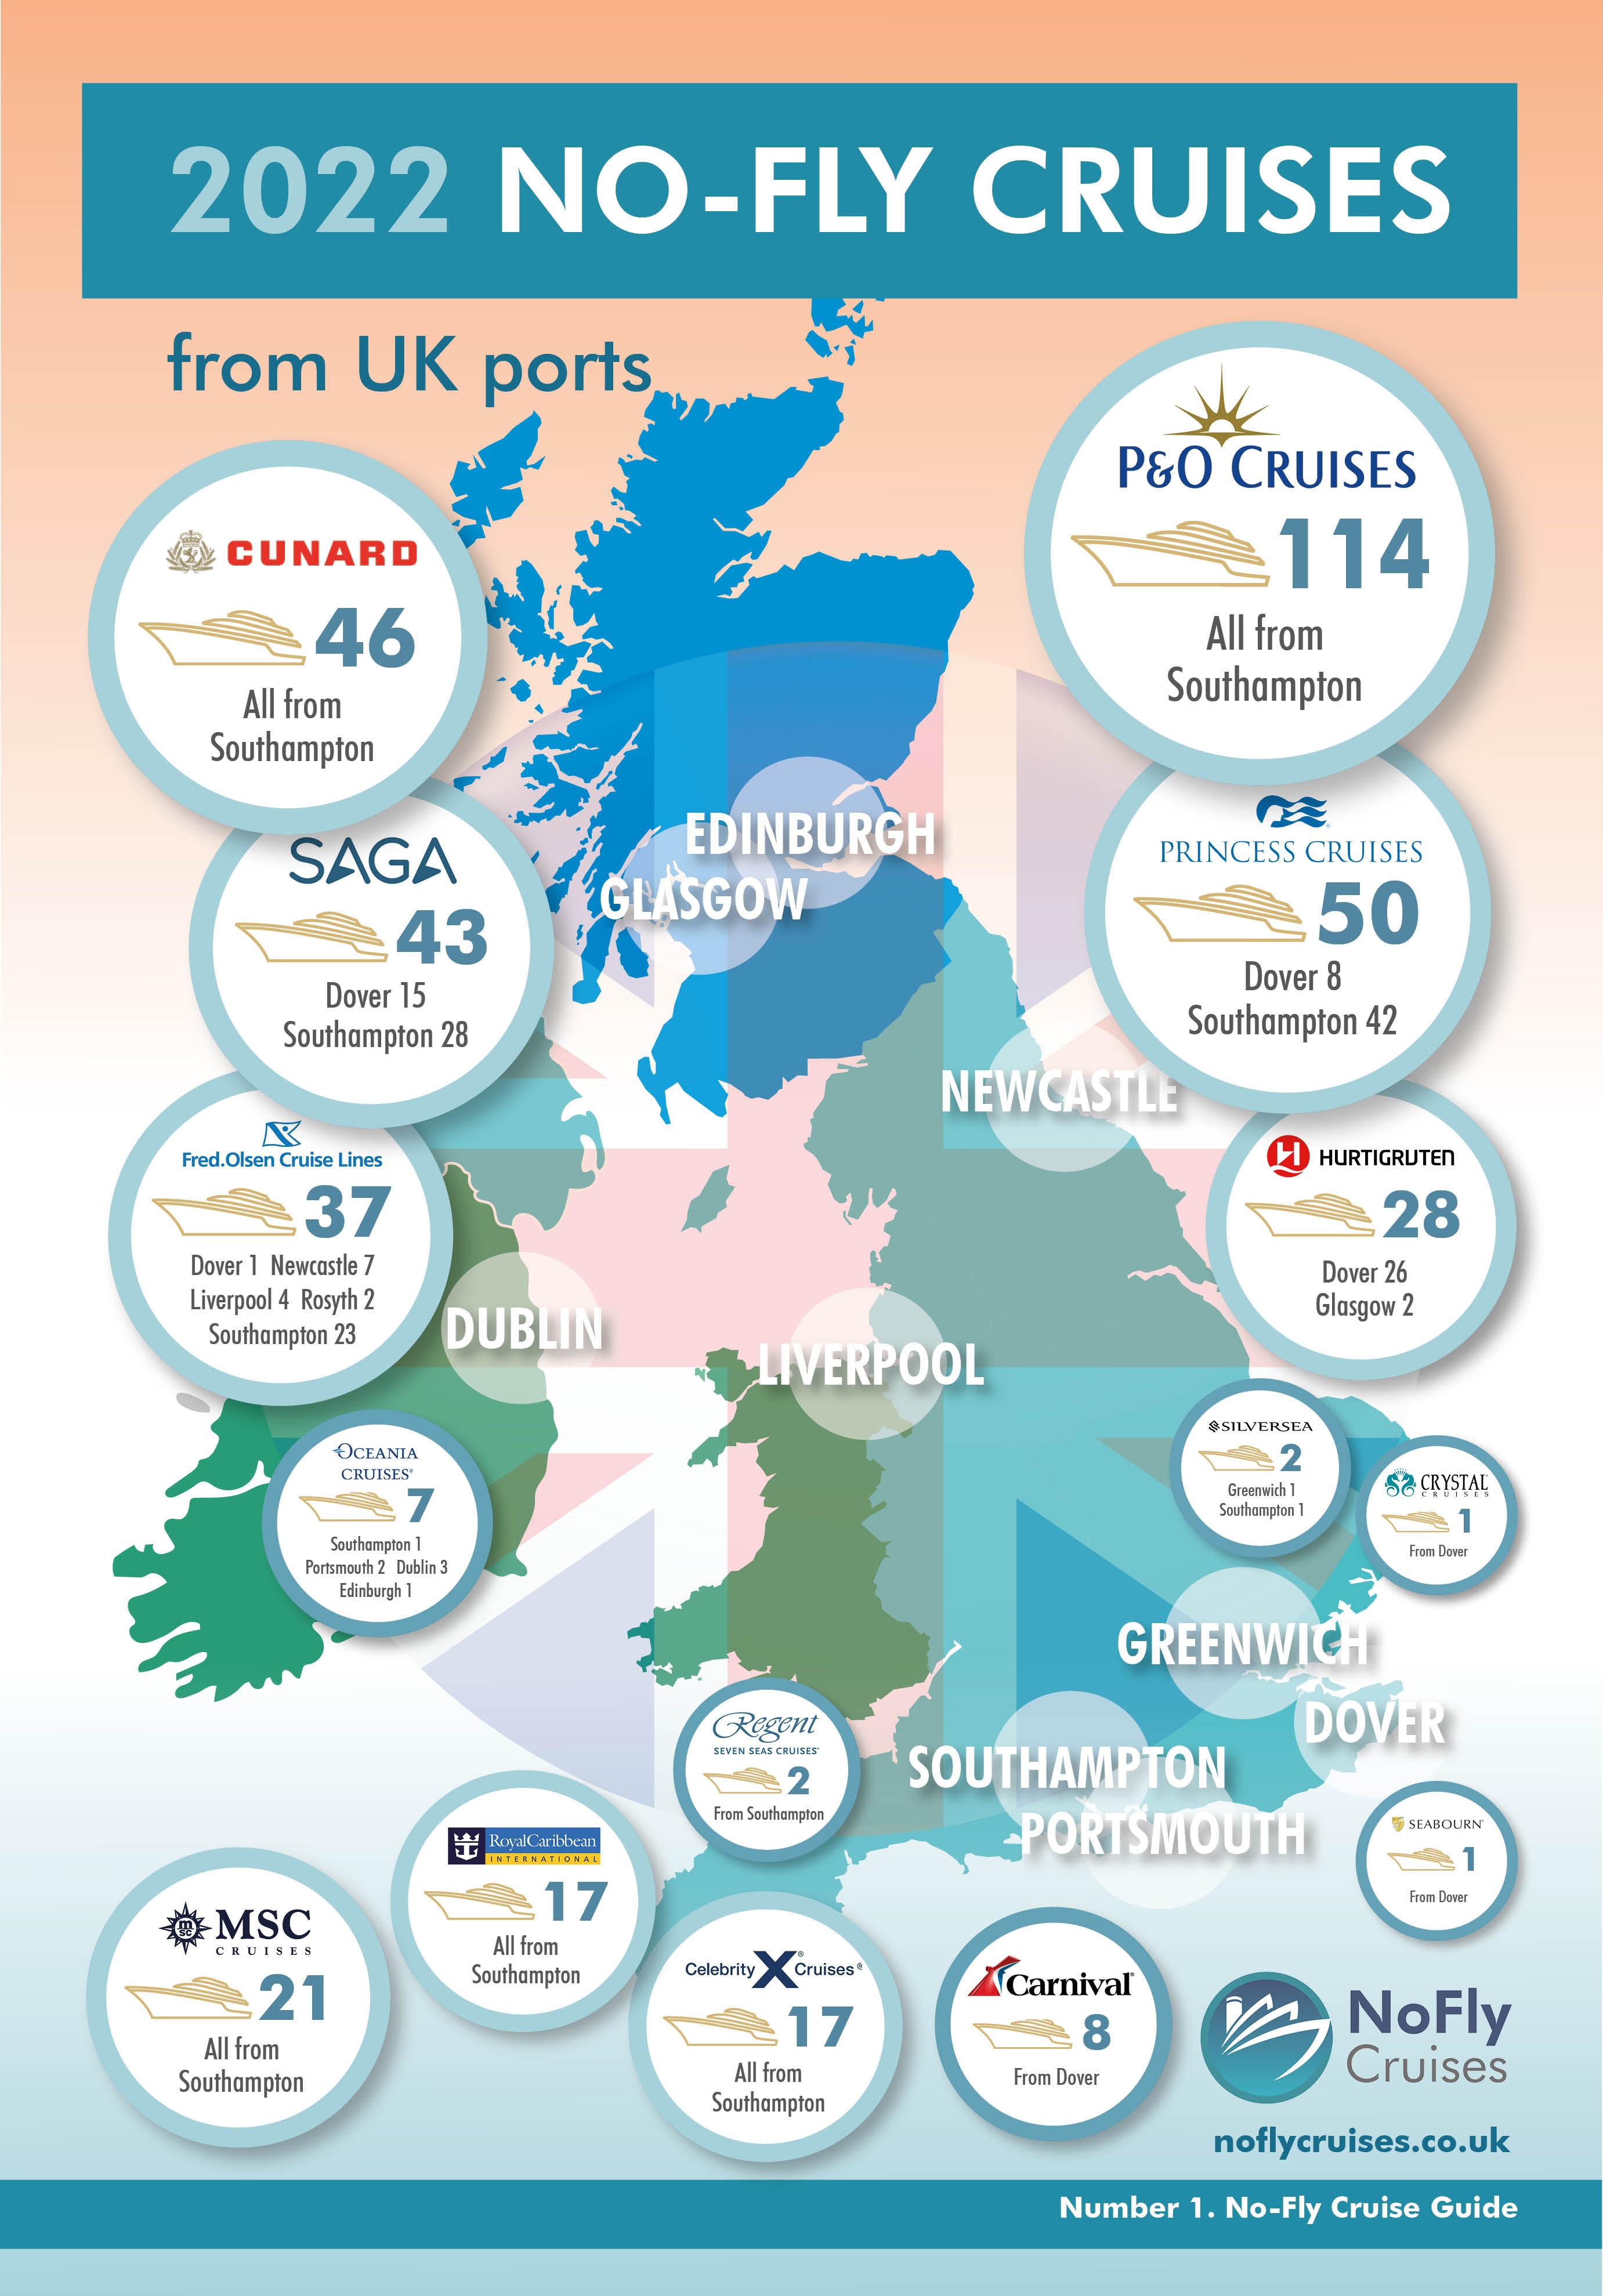 UK No Fly Cruises 2022 Infographic